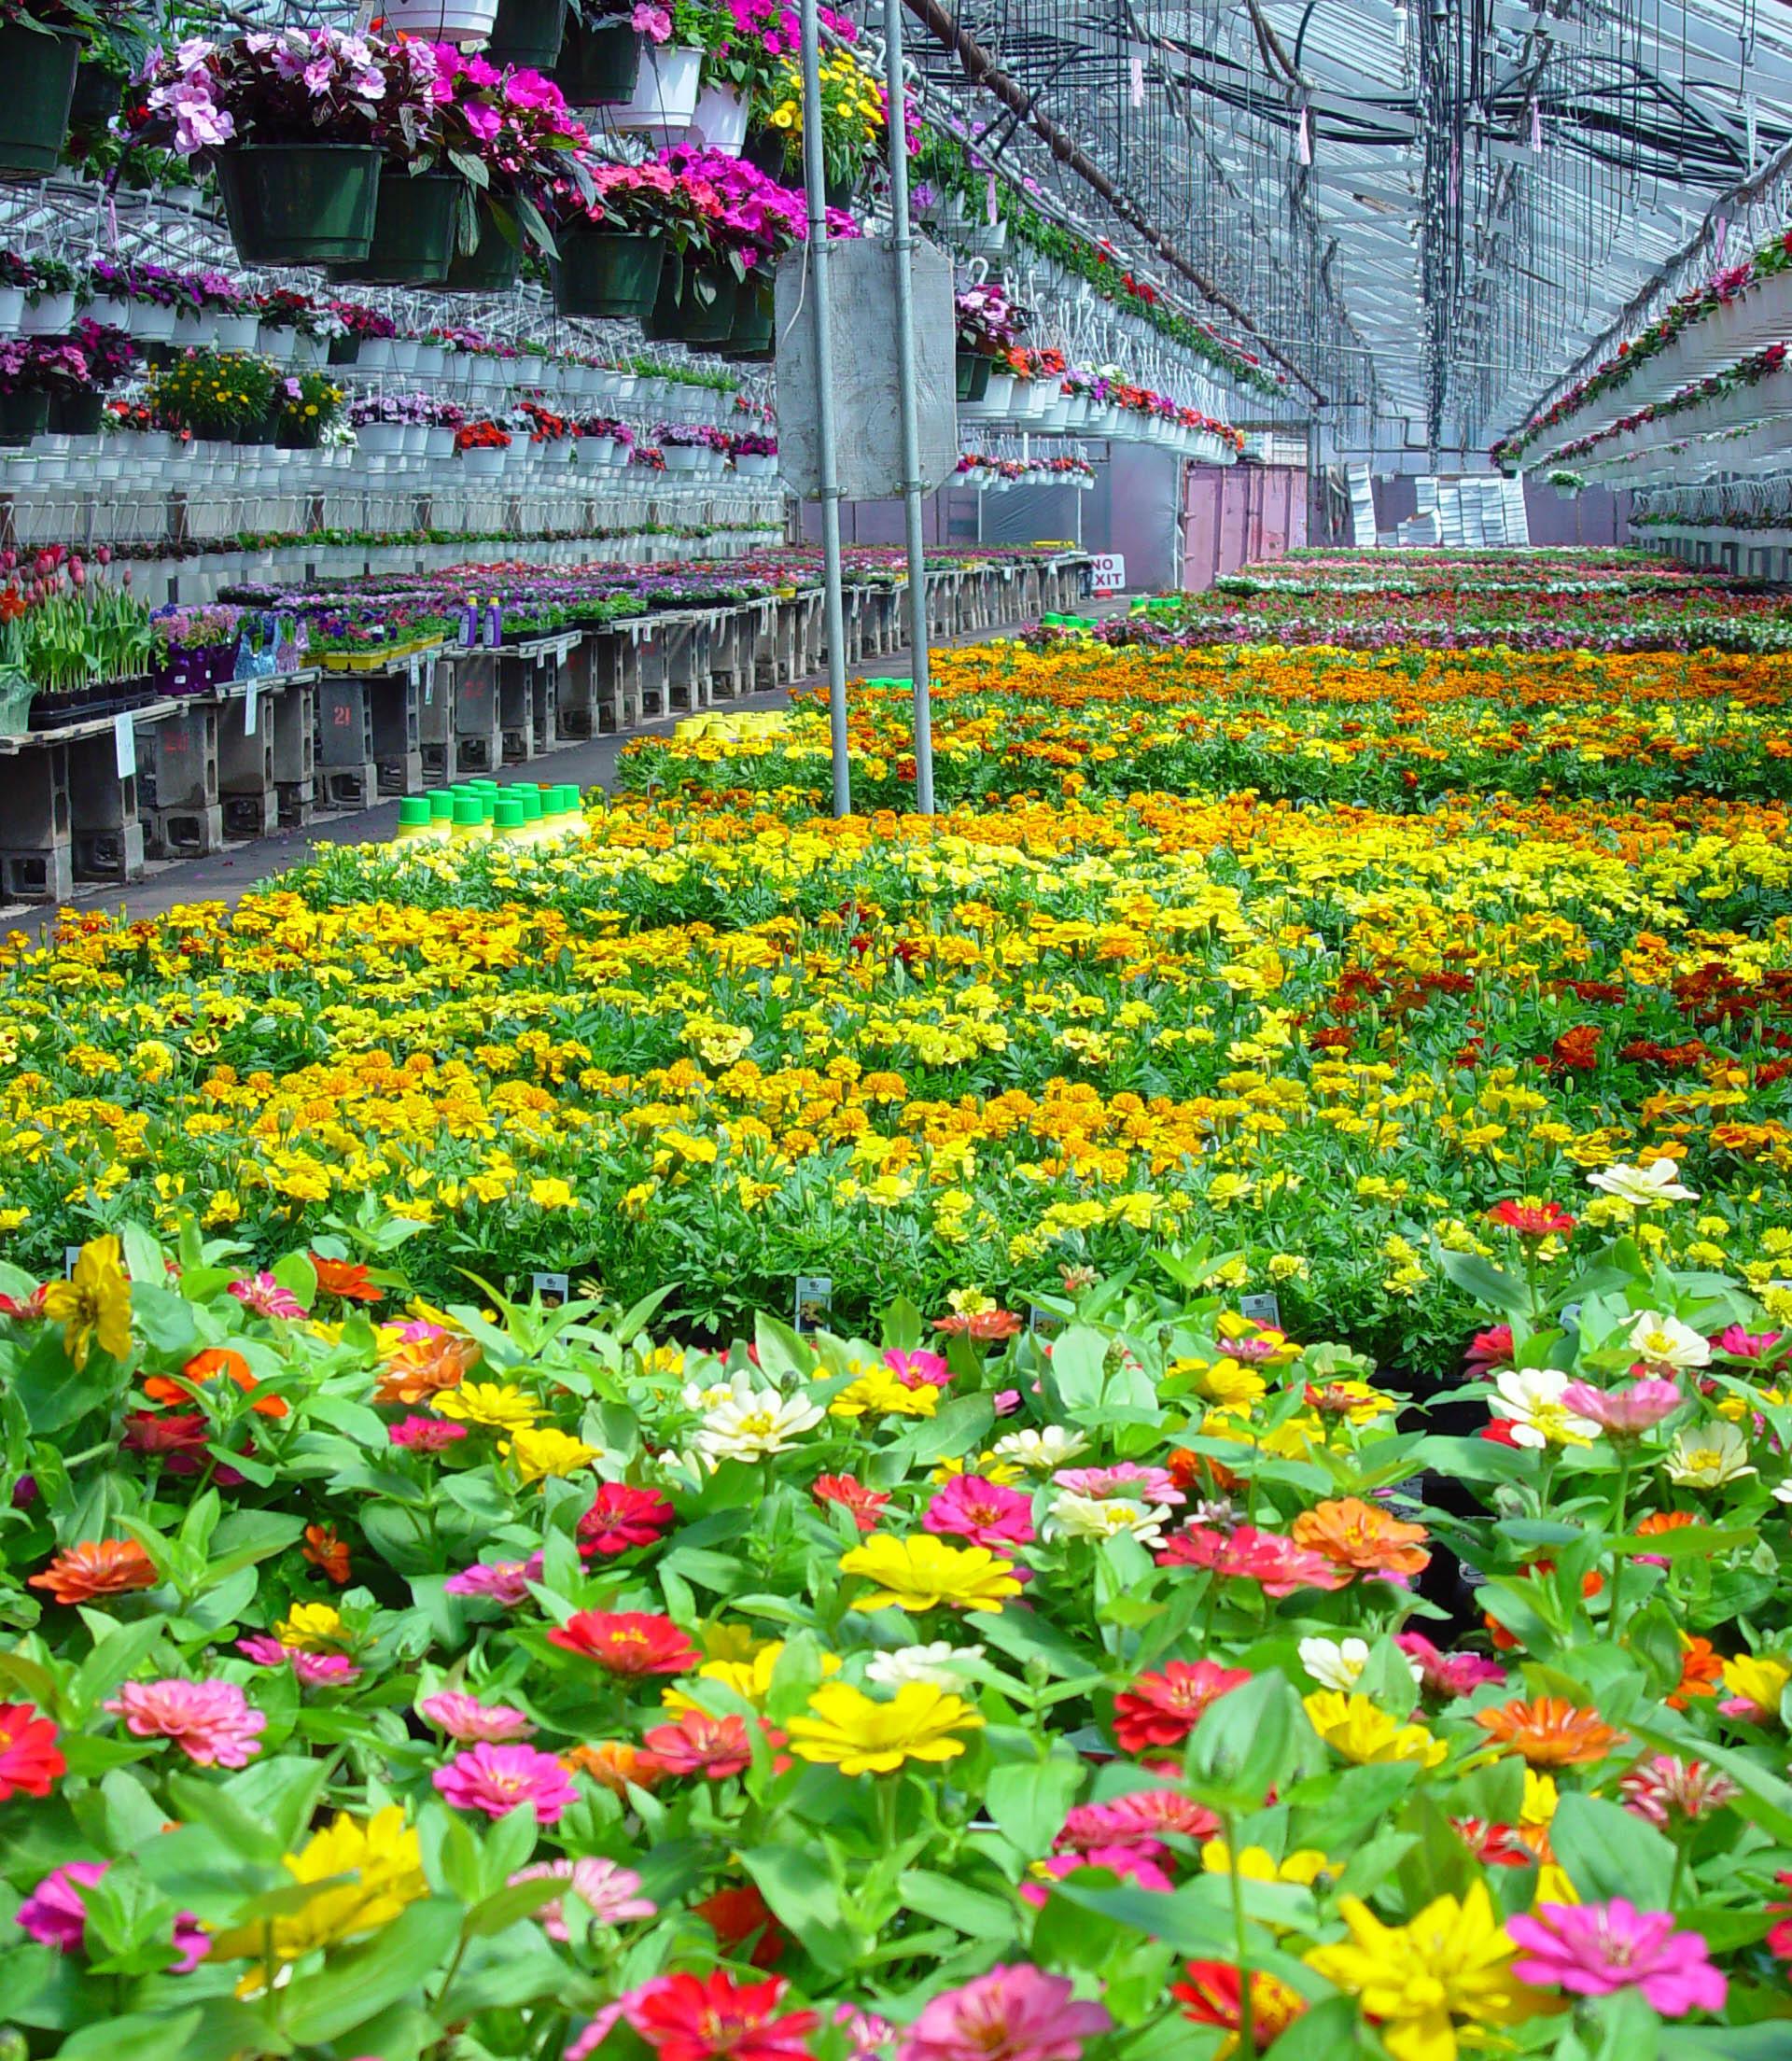 179fedd2442becc259f4_Parker_Gardens_greenhouse_5-7-14.jpg